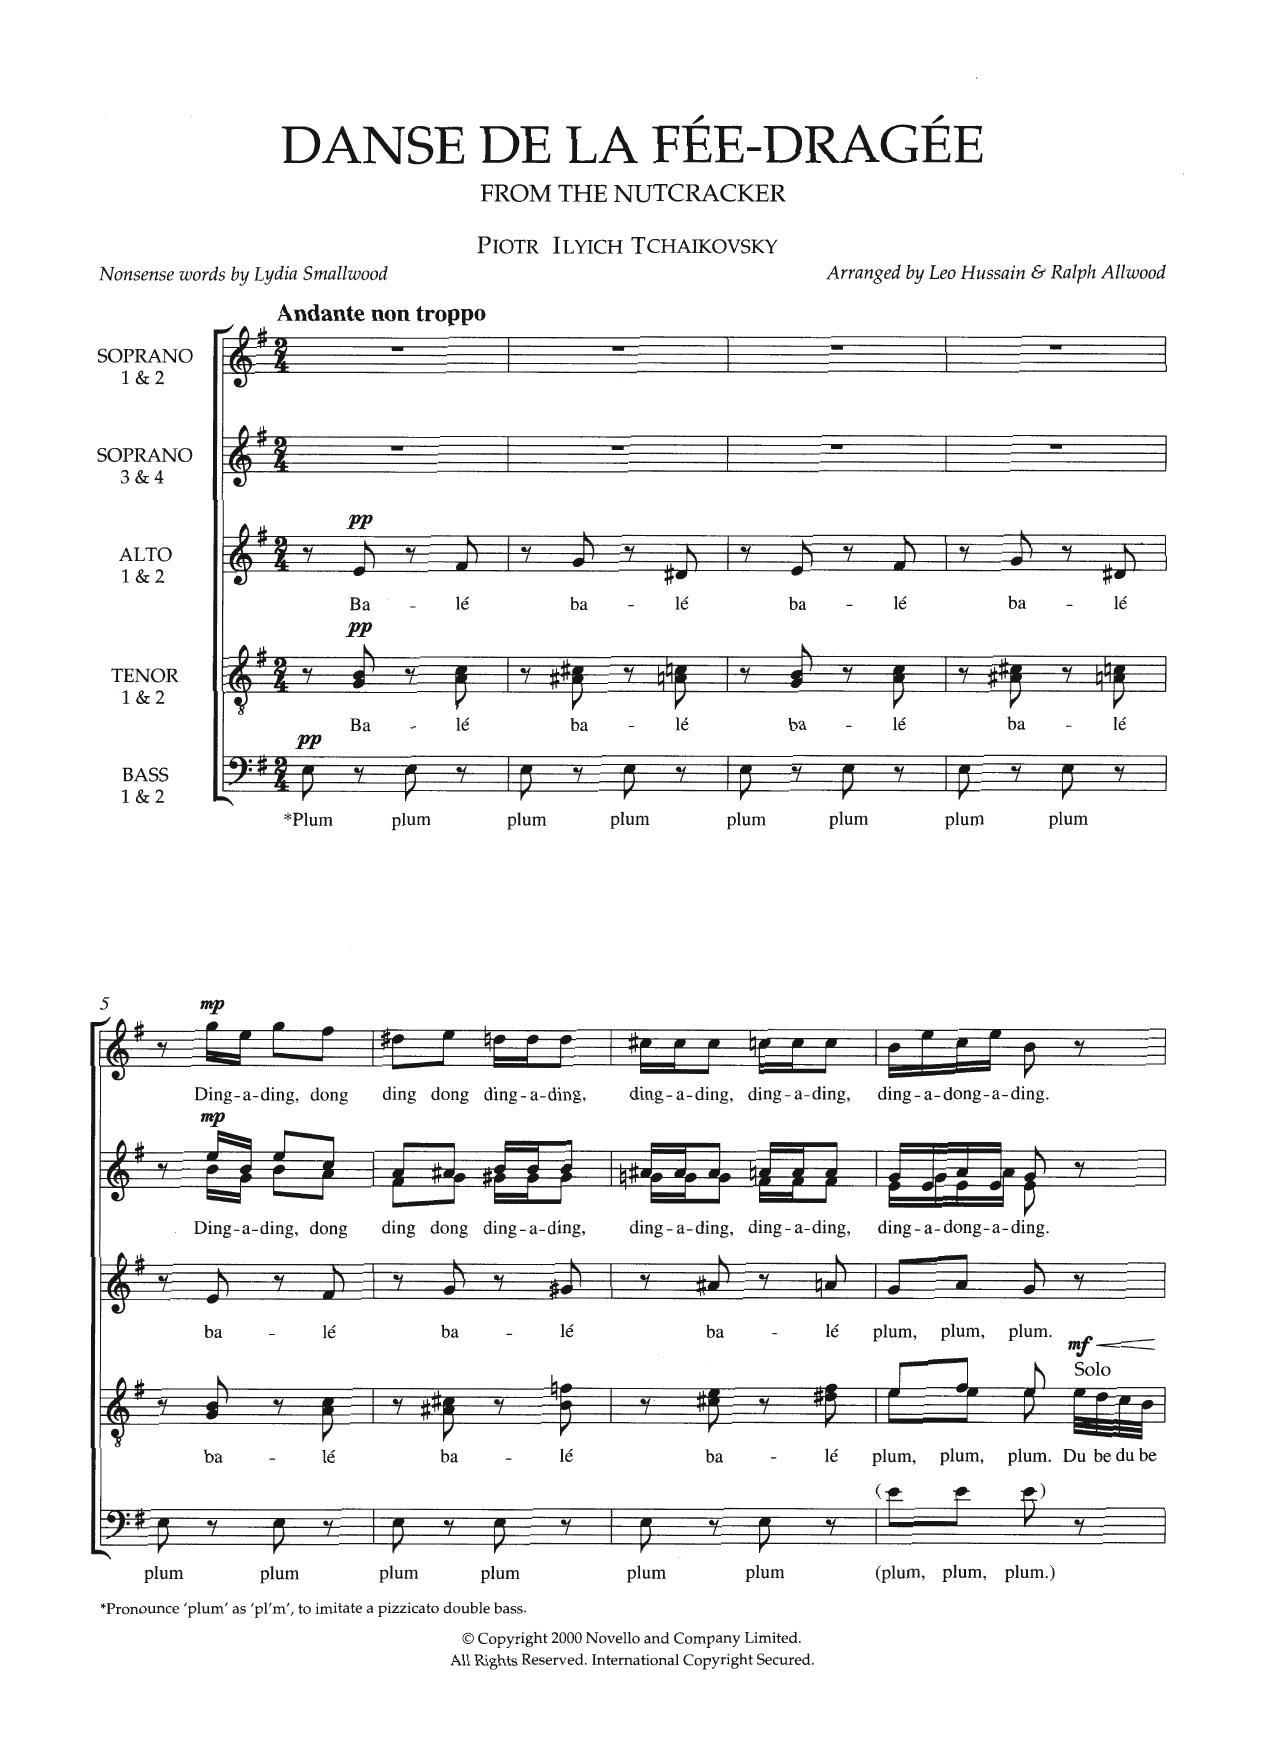 Pyotr Ilyich Tchaikovsky - Dance Of The Sugar Plum Fairy (From The Nutcracker) (arr. Leo Hussain and Ralph Allwood)